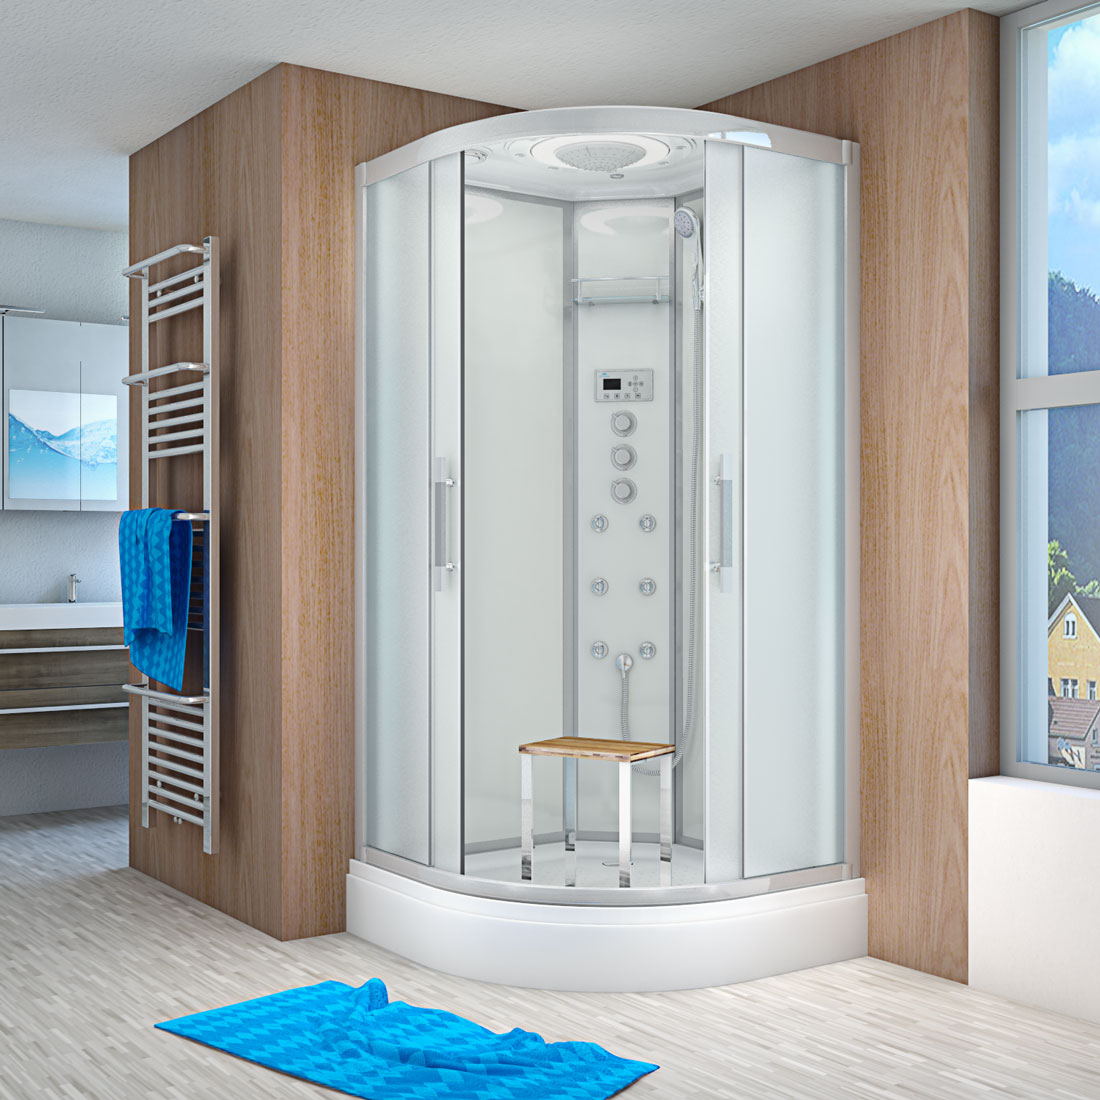 acquavapore quick26 2013 ws dusche 100x100cm. Black Bedroom Furniture Sets. Home Design Ideas